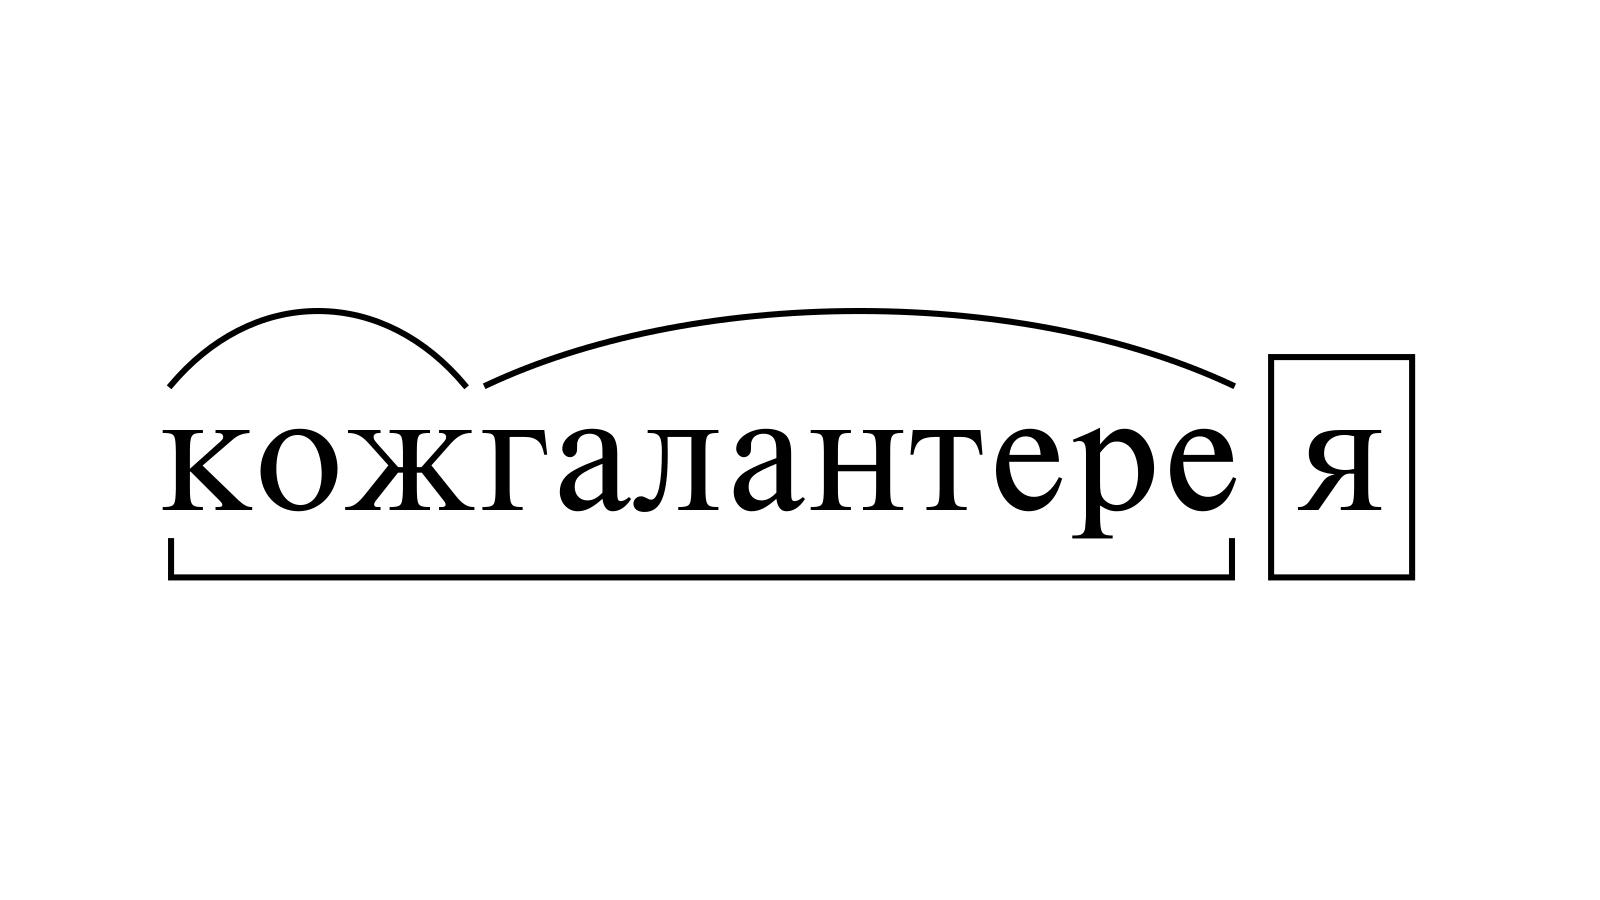 Разбор слова «кожгалантерея» по составу